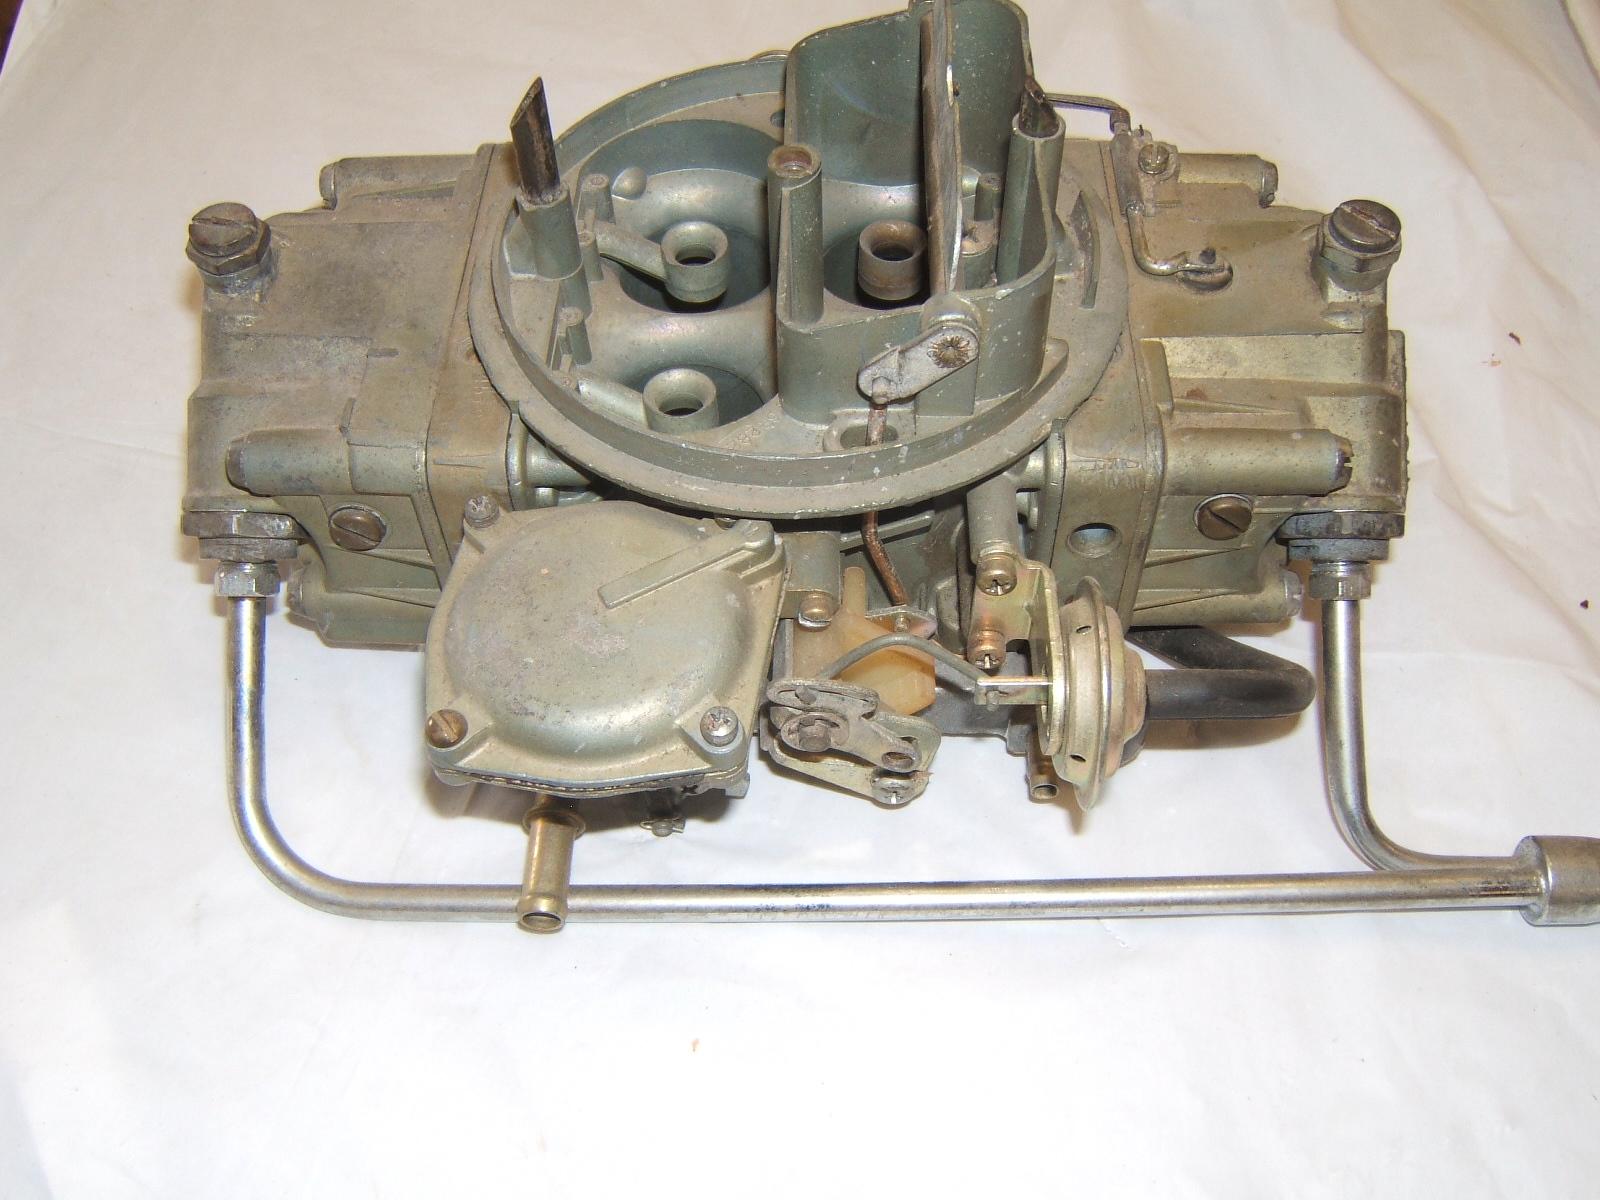 1966 Chevrolet chevelle 396/ 375 holley 4bbl carburetor 3893229 list 3613 (a 3893229 list 3613)